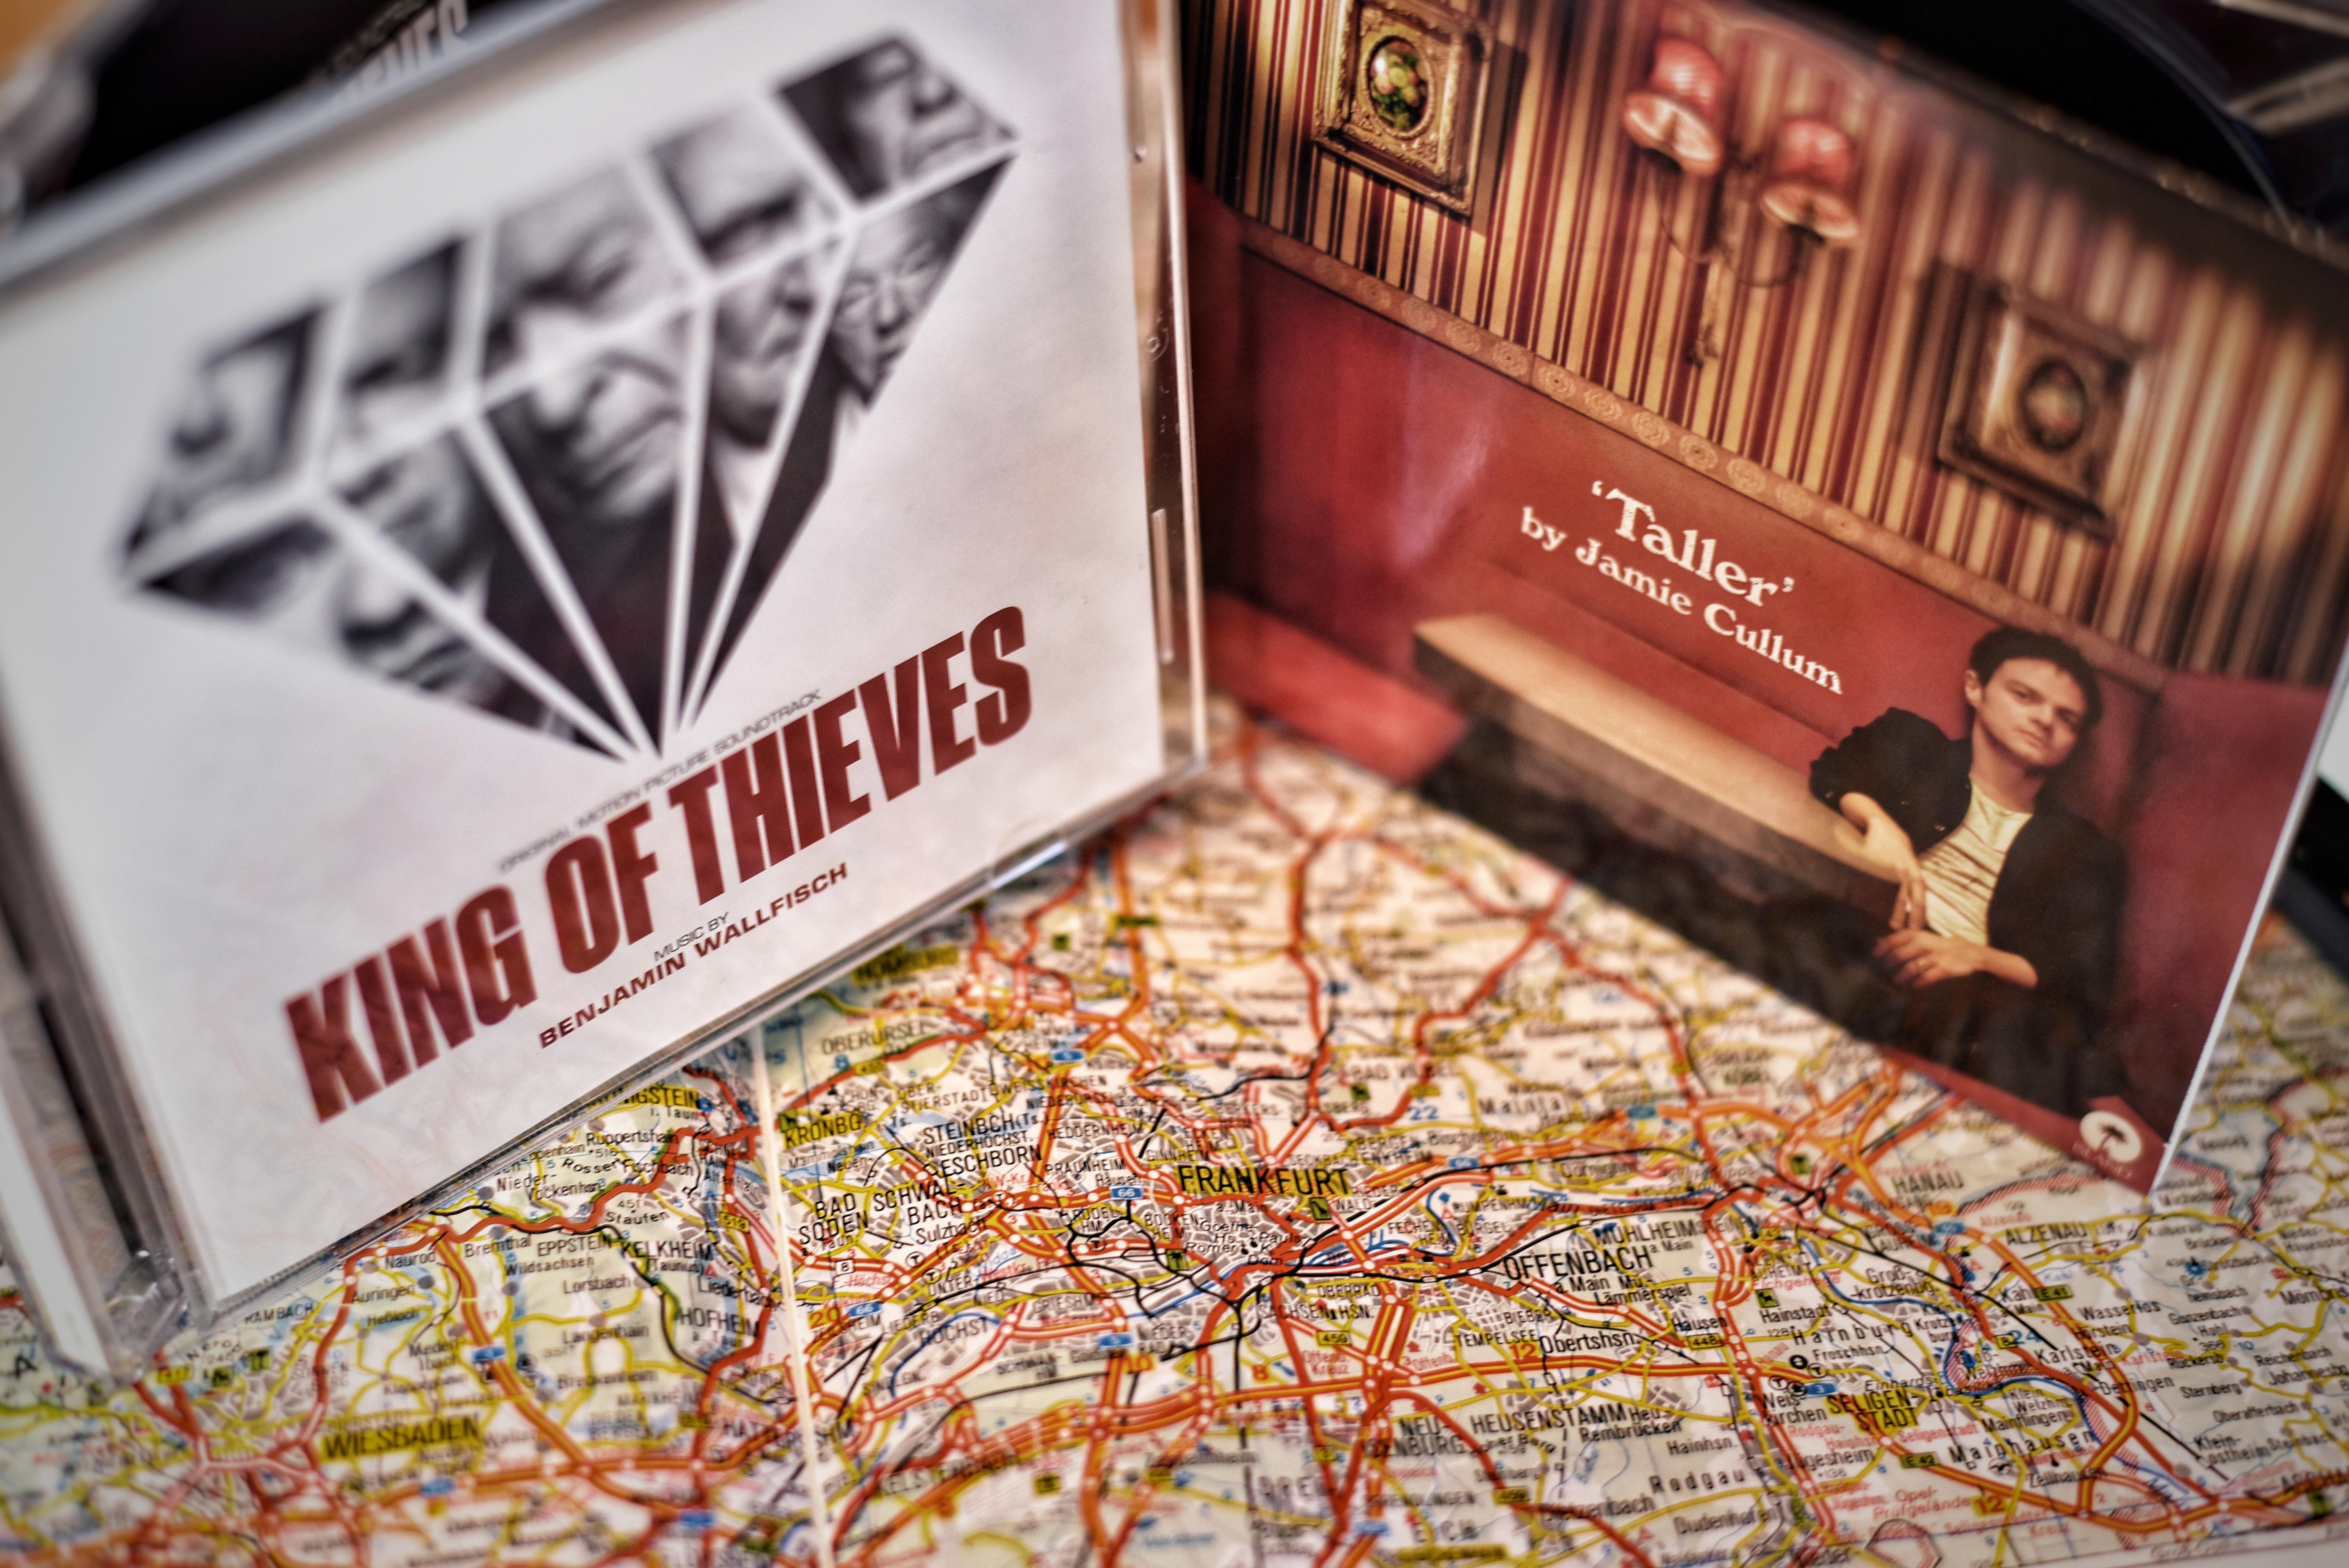 Jamie Cullum Taller und King of Thieves Soundtrack